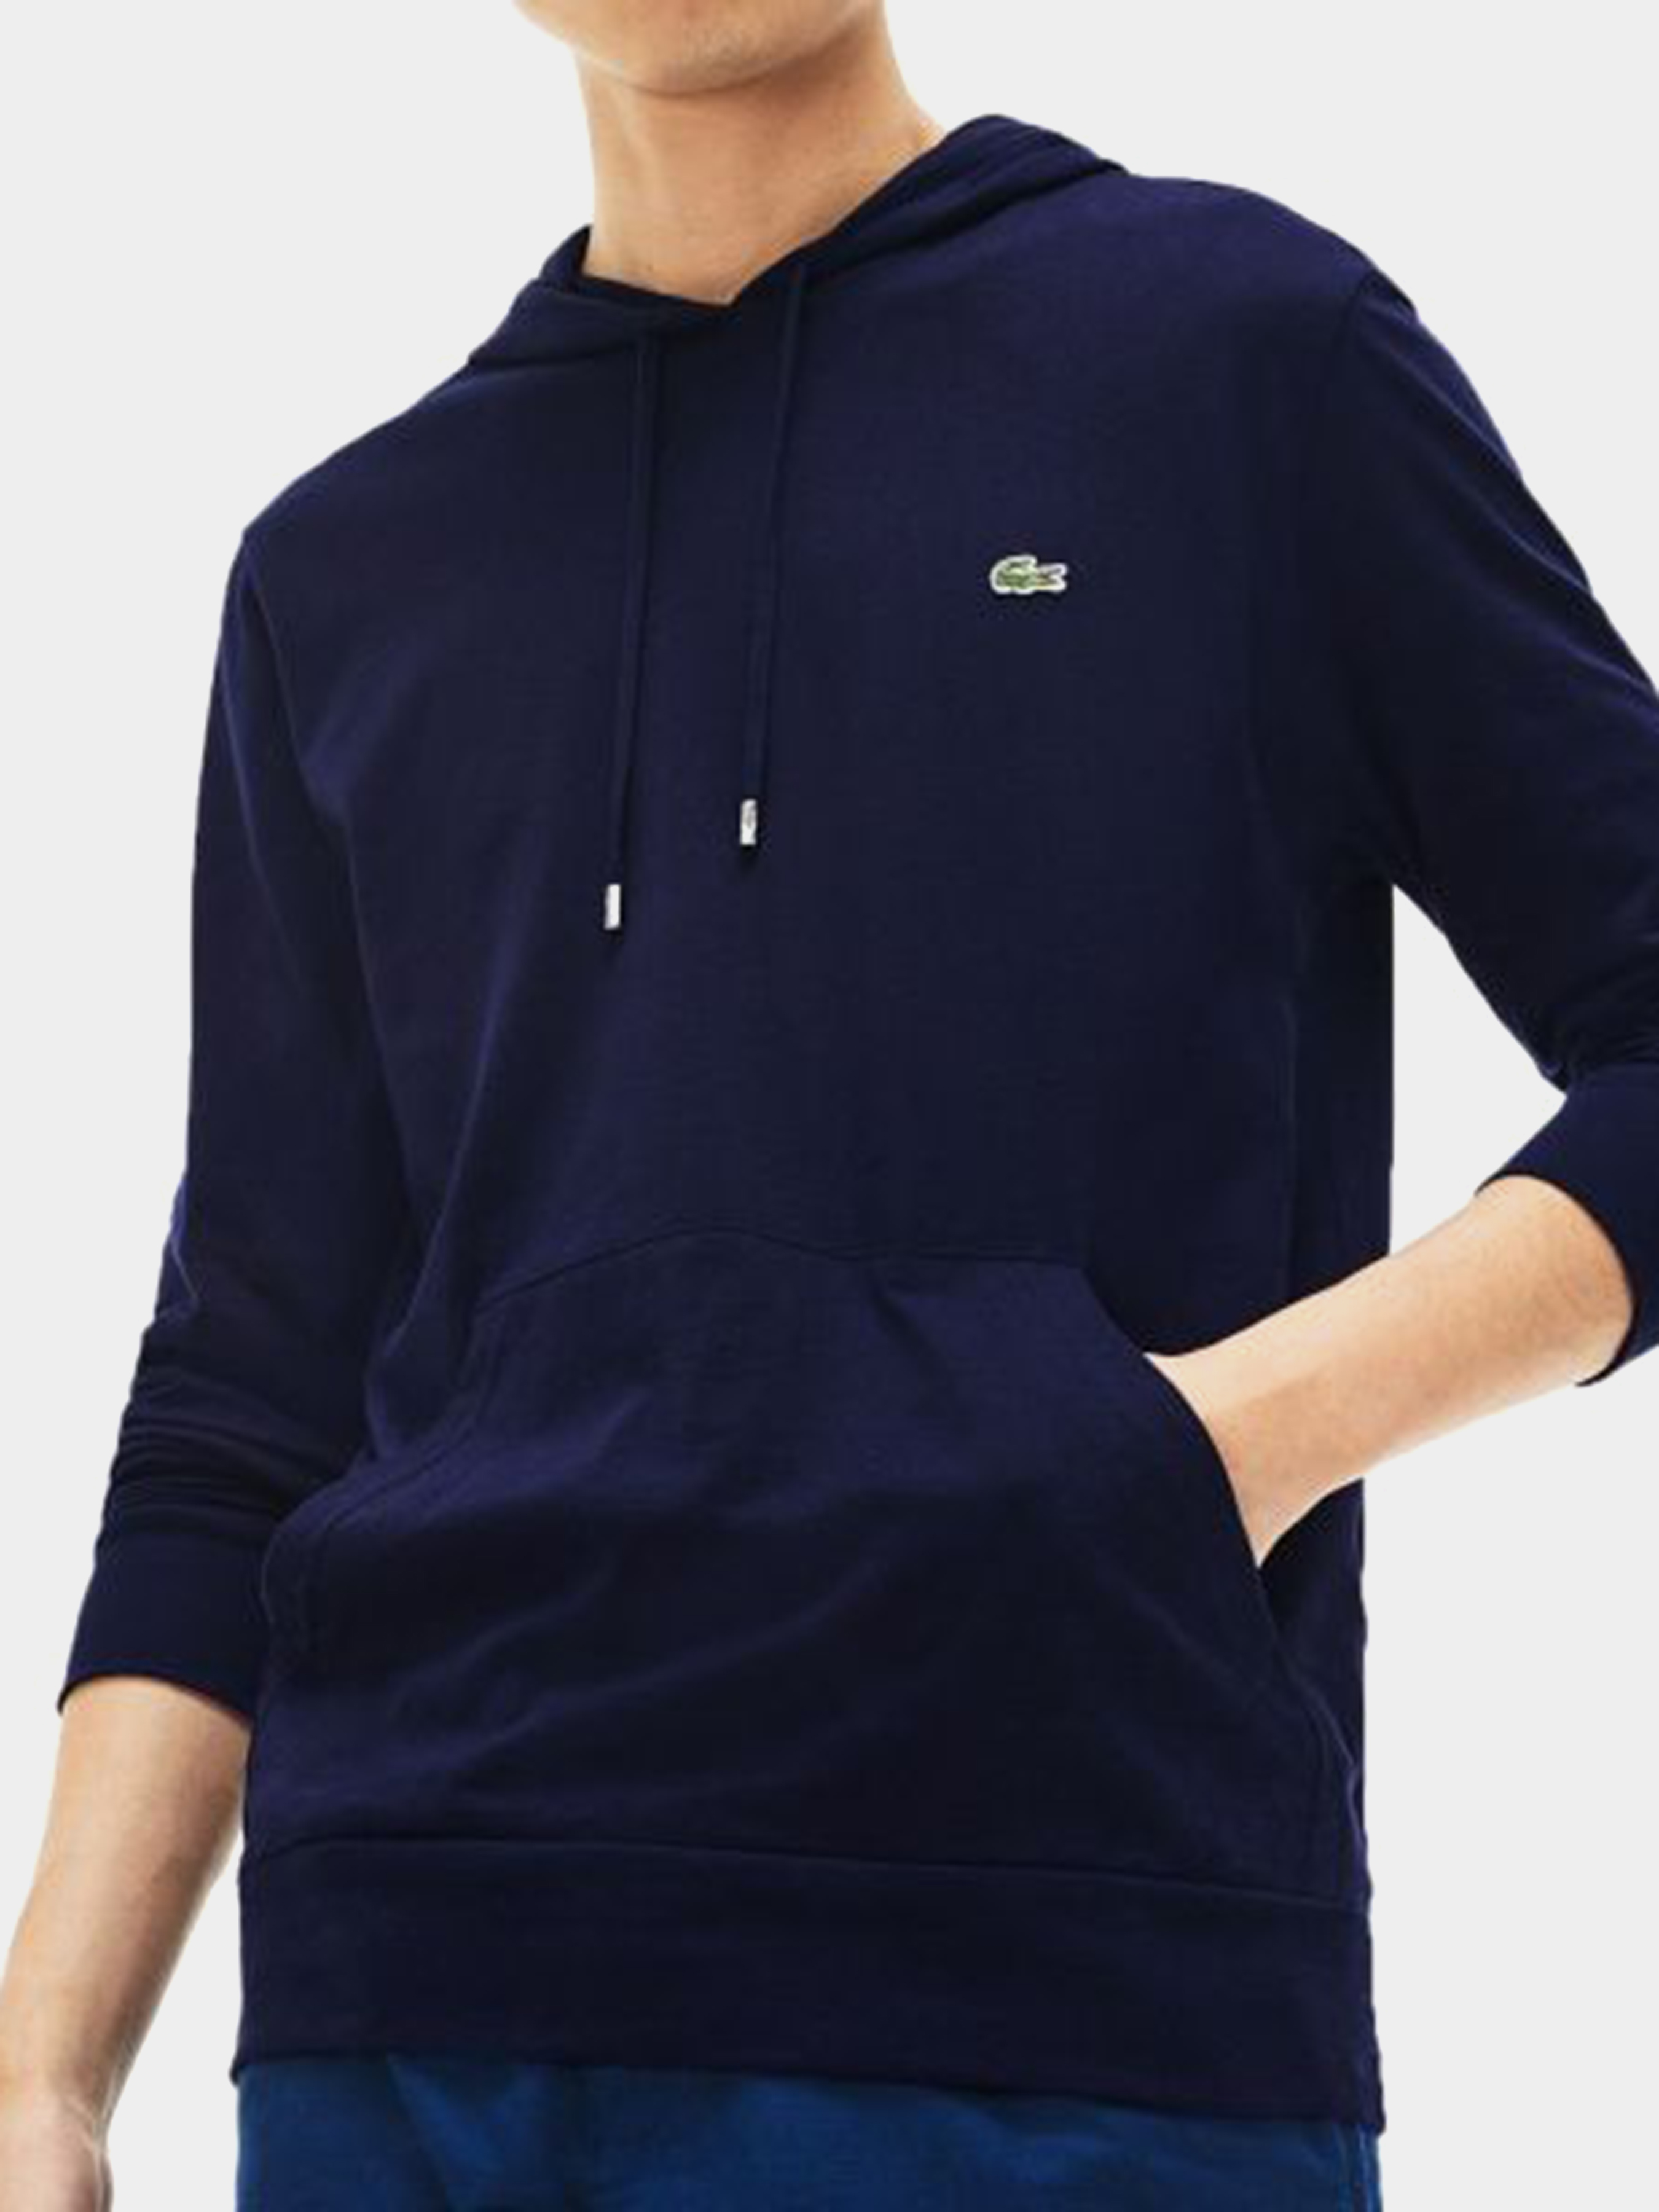 Кофты и свитера мужские Lacoste модель TH9349166 характеристики, 2017